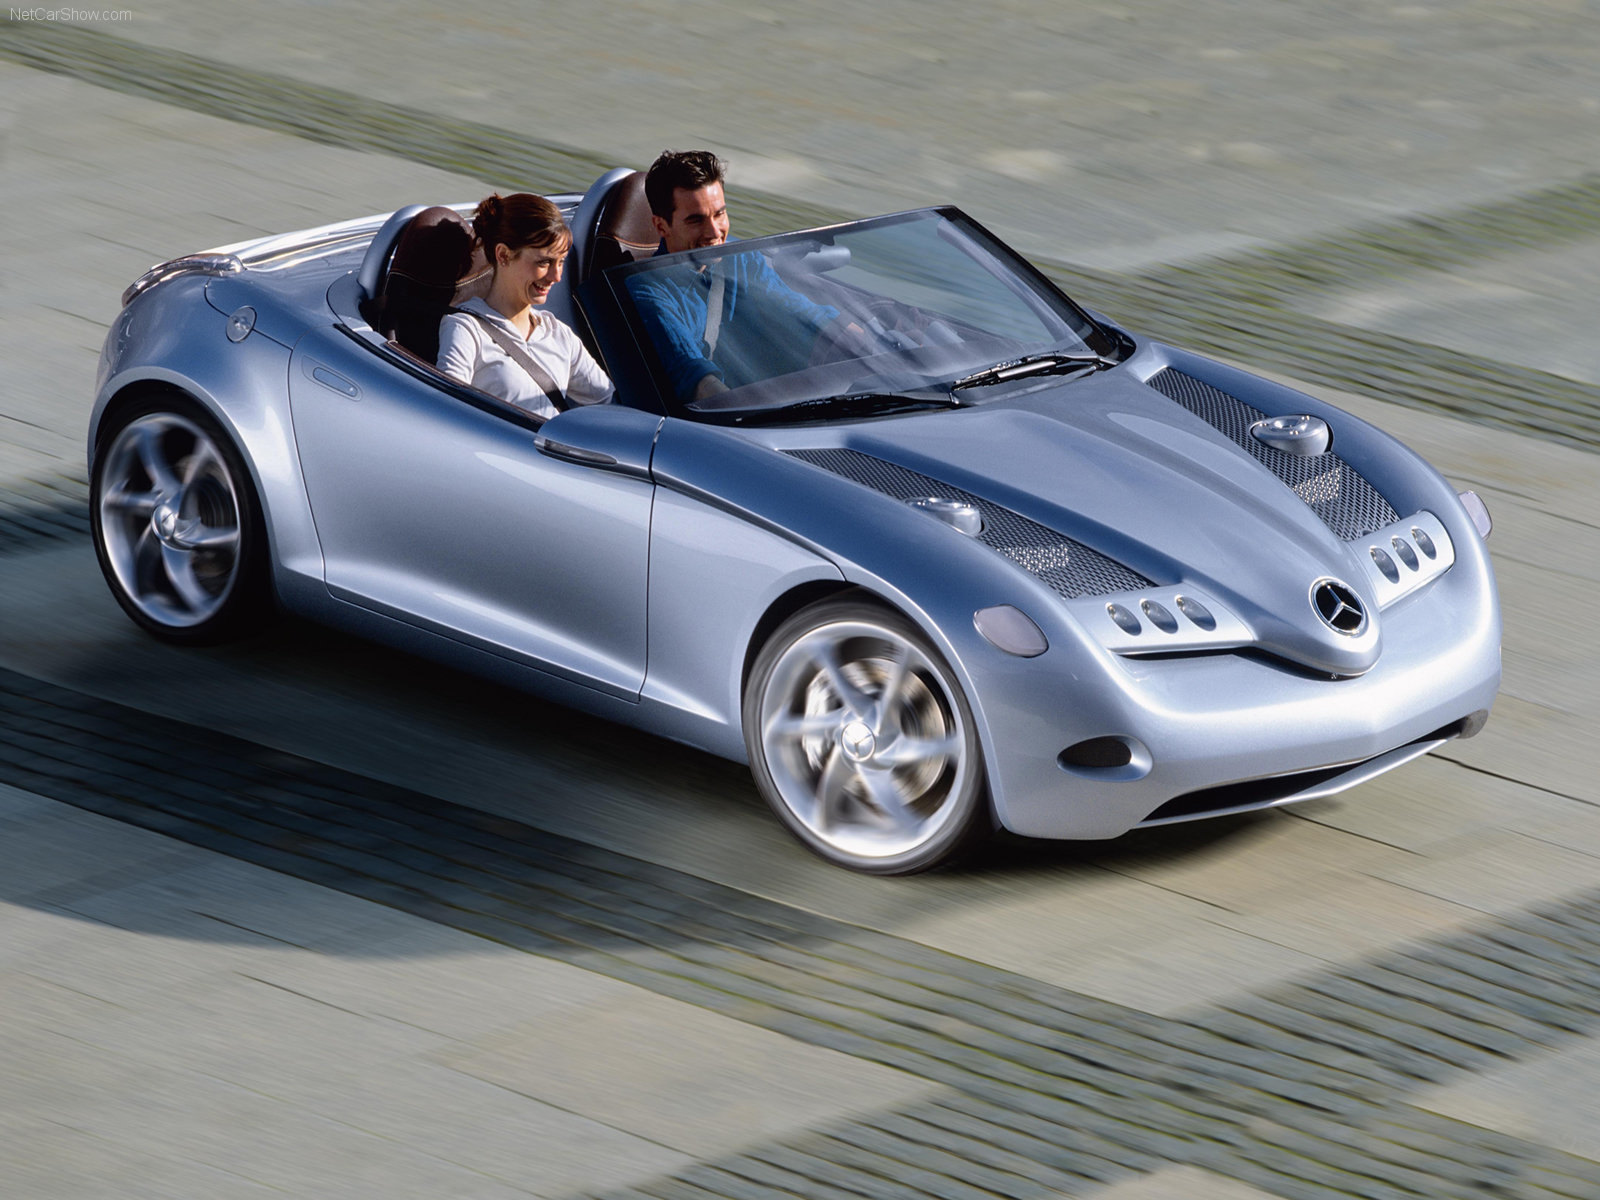 Mercedes benz vision sla picture 37143 mercedes benz for Mercedes benz sla